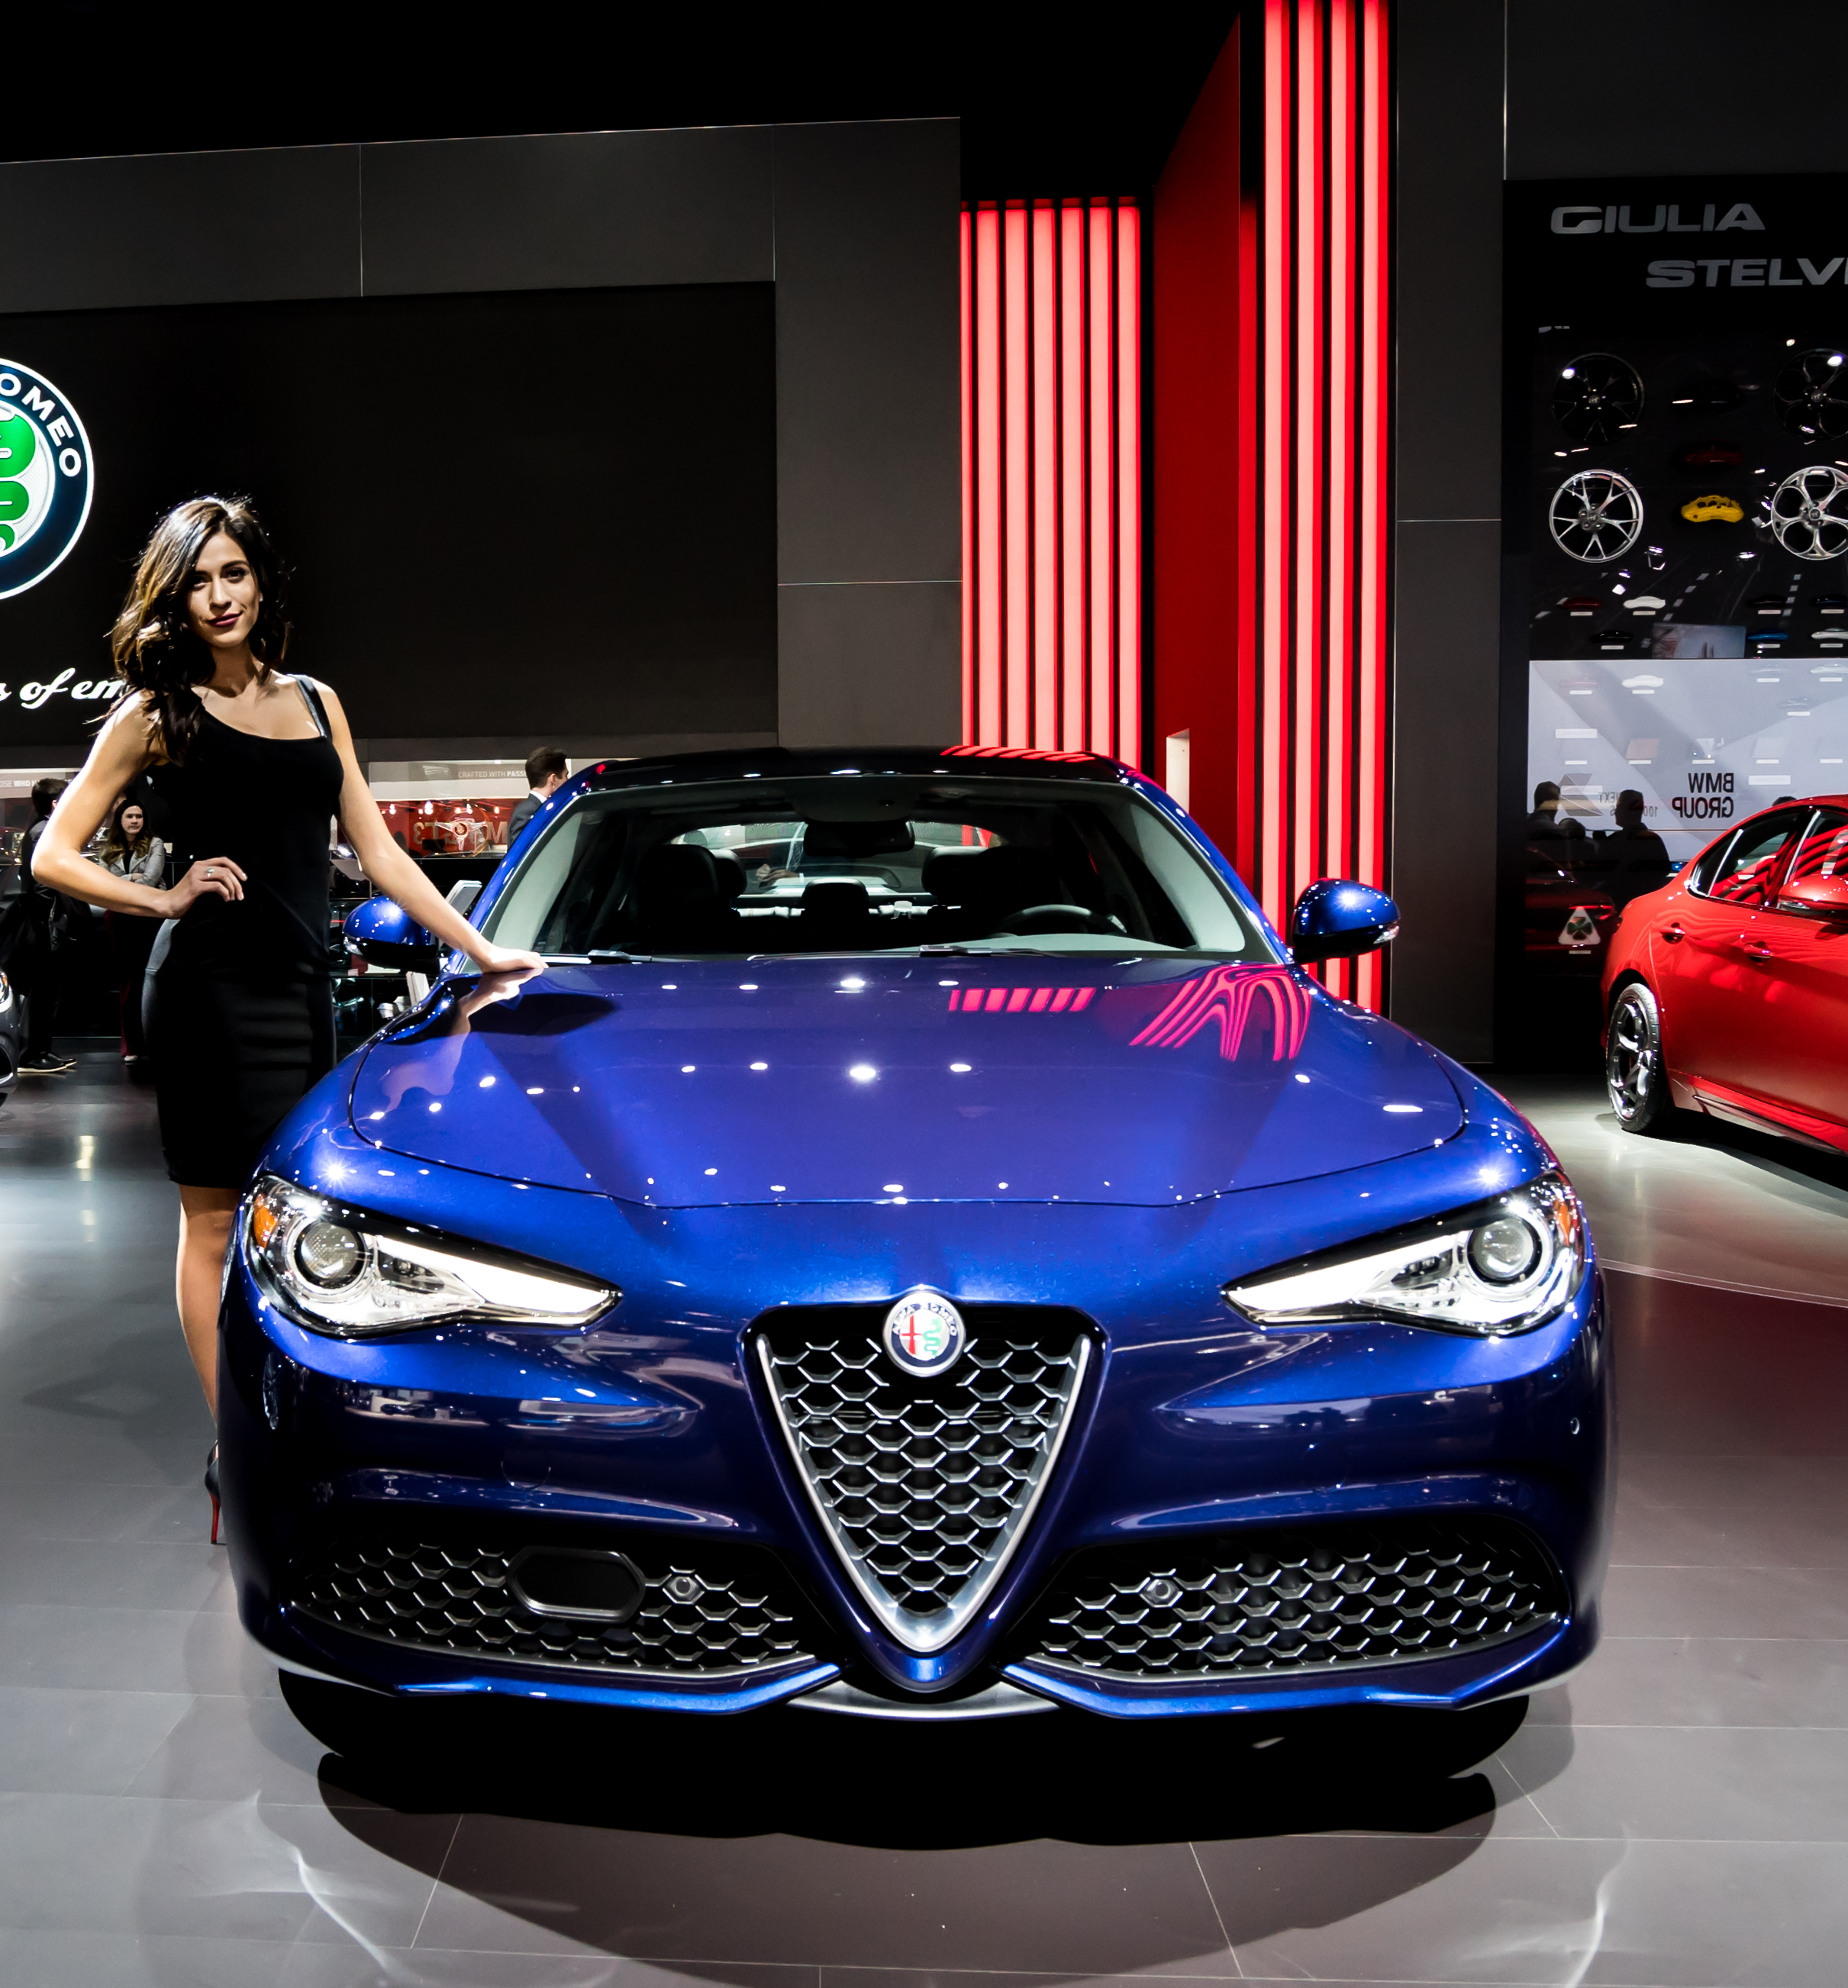 2017 Alfa Romero Giulia